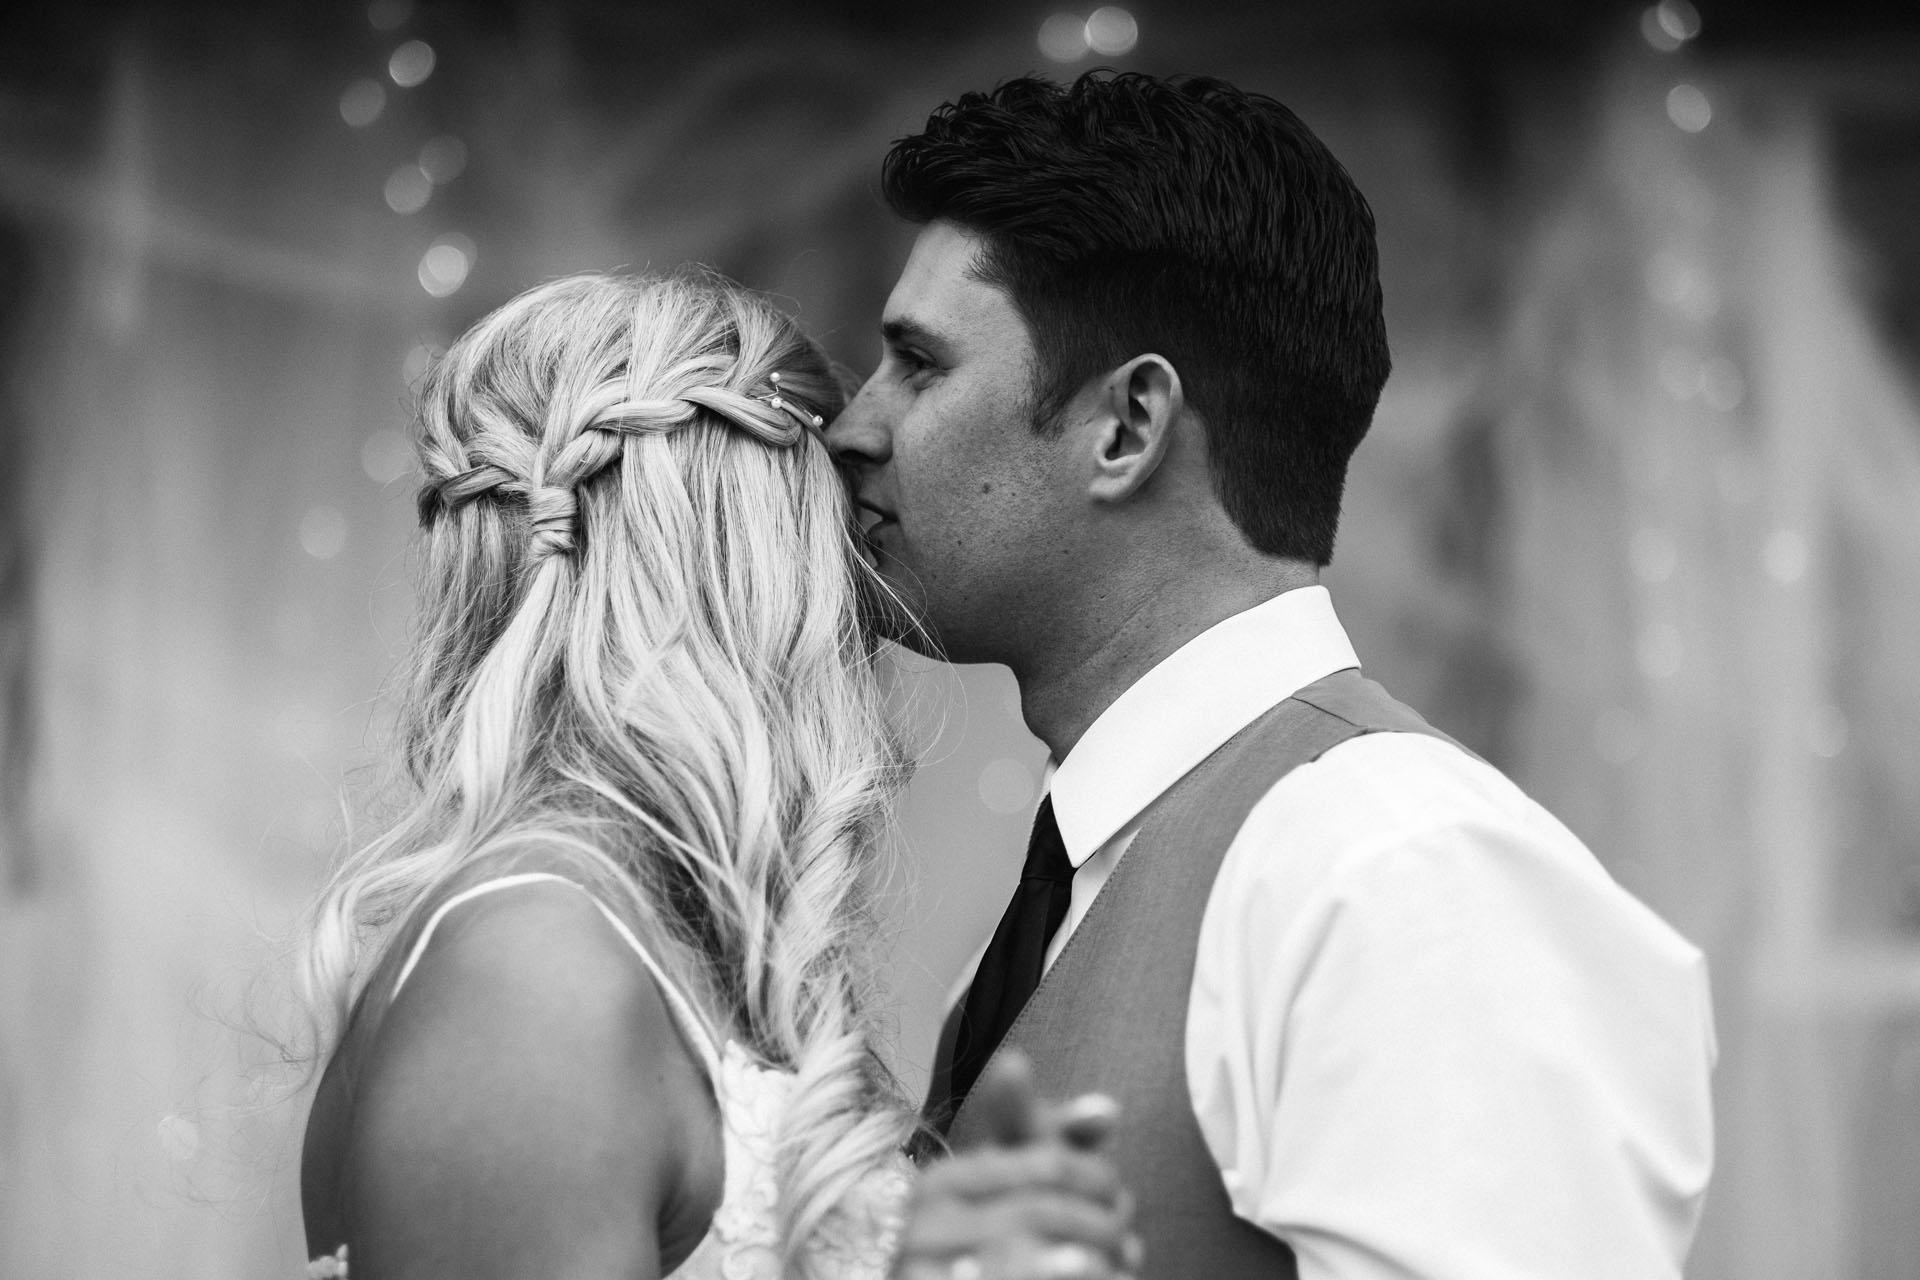 10-7-17 Devon and Jordan's Wedding-216.jpg